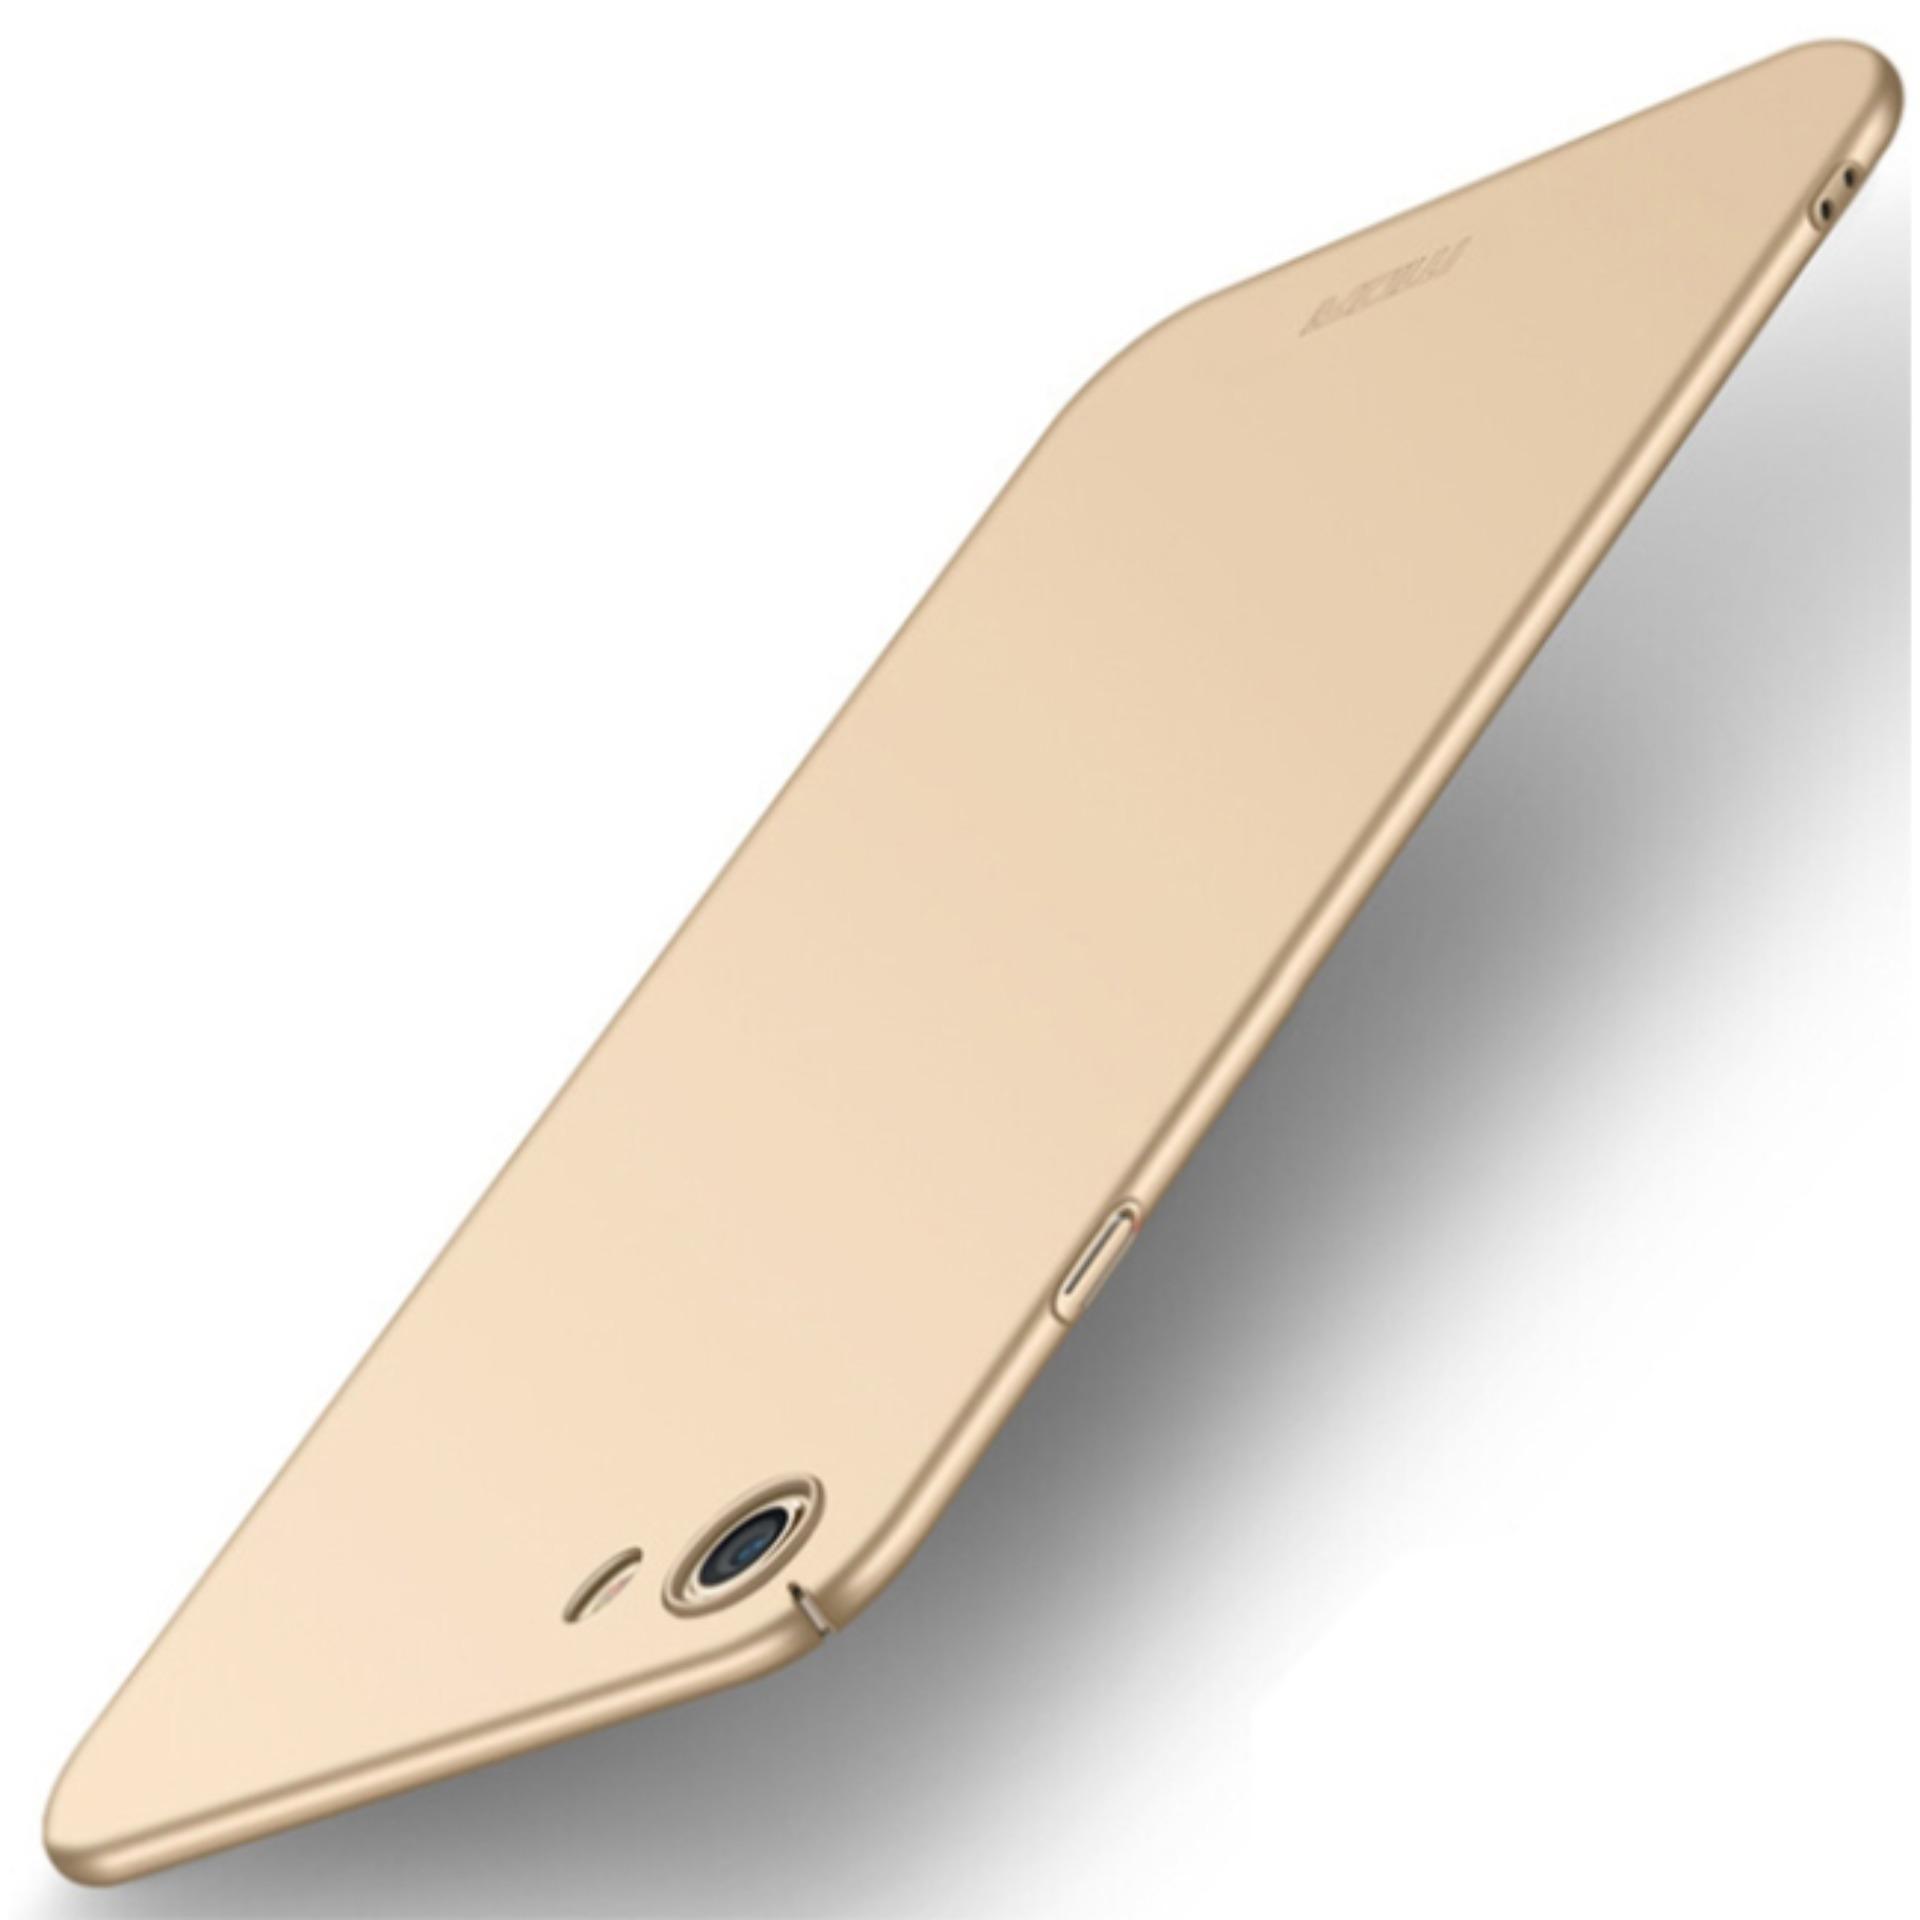 Kehebatan Gsu Samsung Galaxy A8 2018 Baby Skin Ultra Thin Hard Case For S7 Edge Black Oppo A83